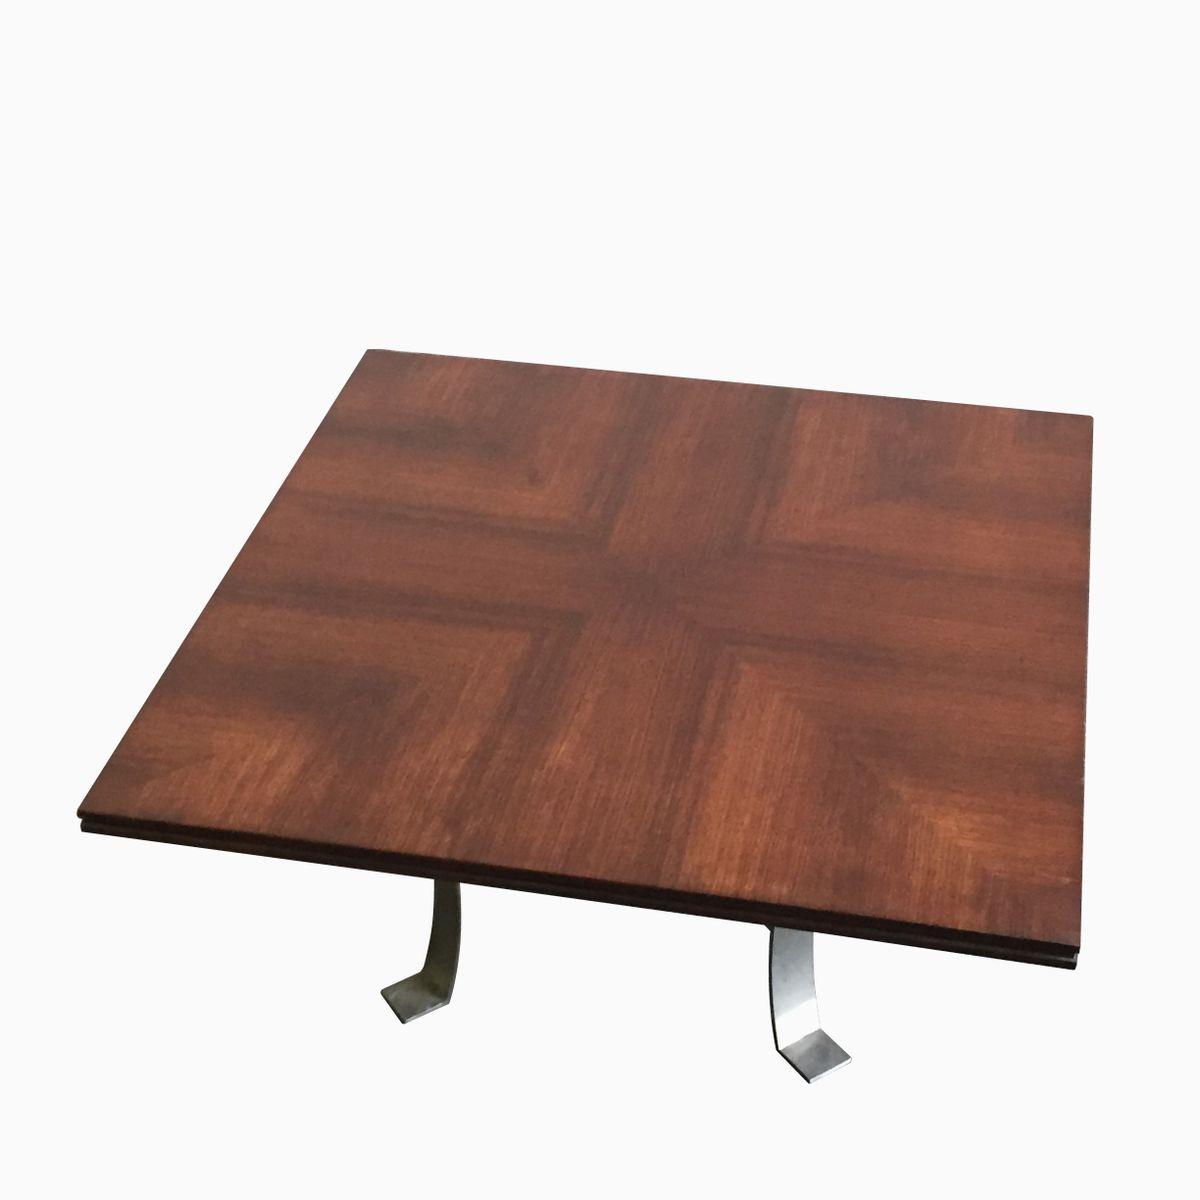 Square Coffee Table Metal Legs: Vintage Square Coffee Table With Metal Legs For Sale At Pamono